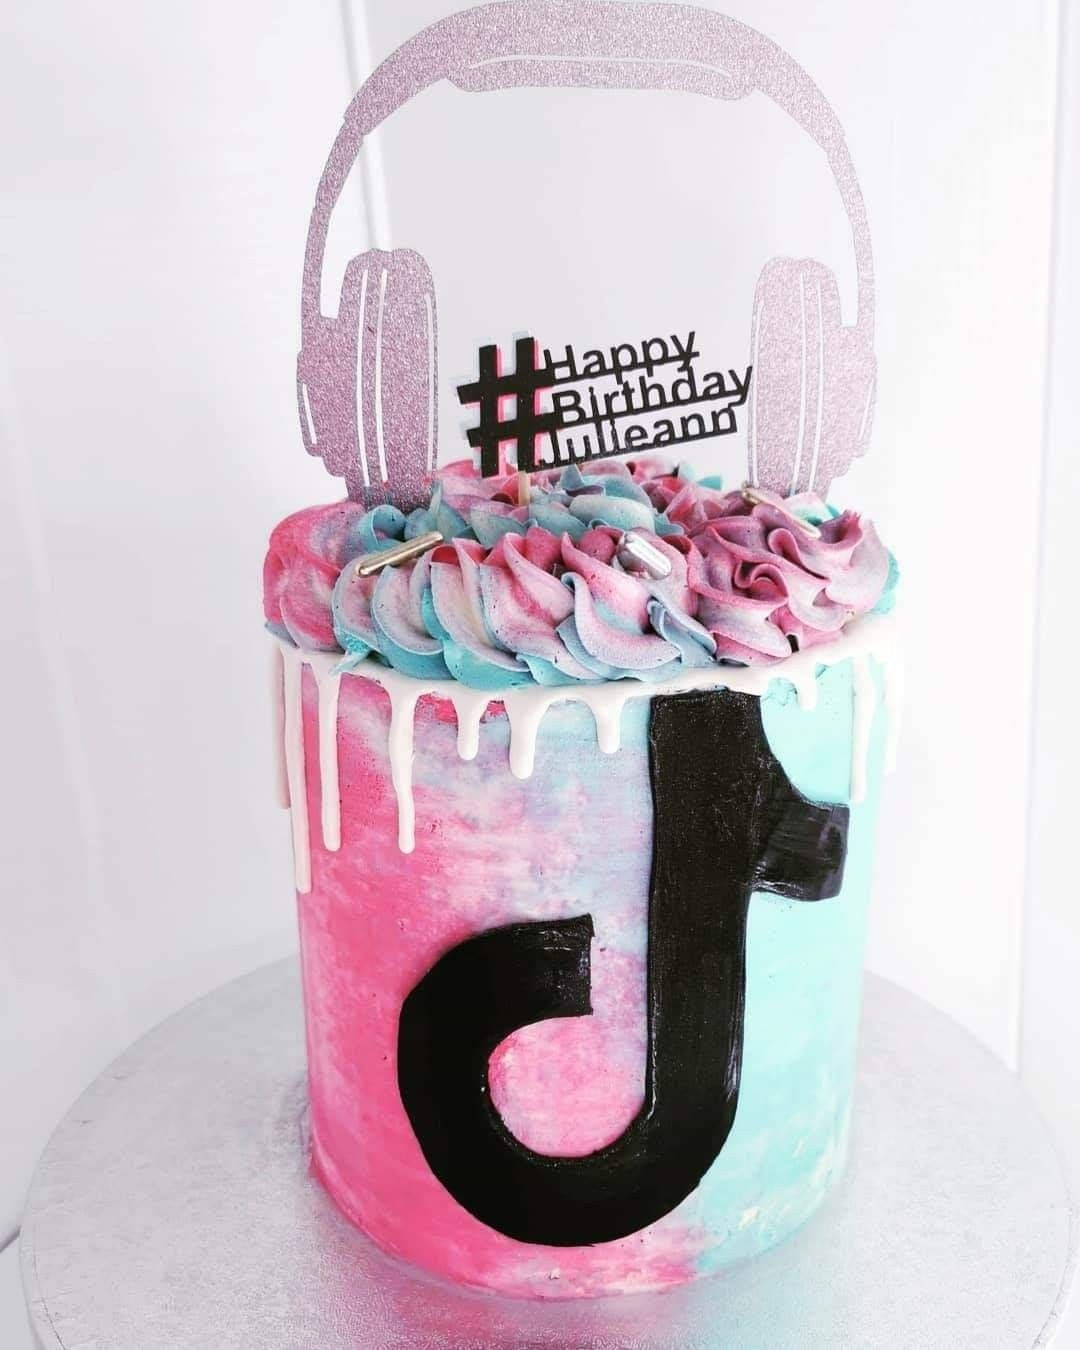 Tiktok Birthday Cake In 2020 14th Birthday Cakes 12th Birthday Cake Unique Birthday Cakes